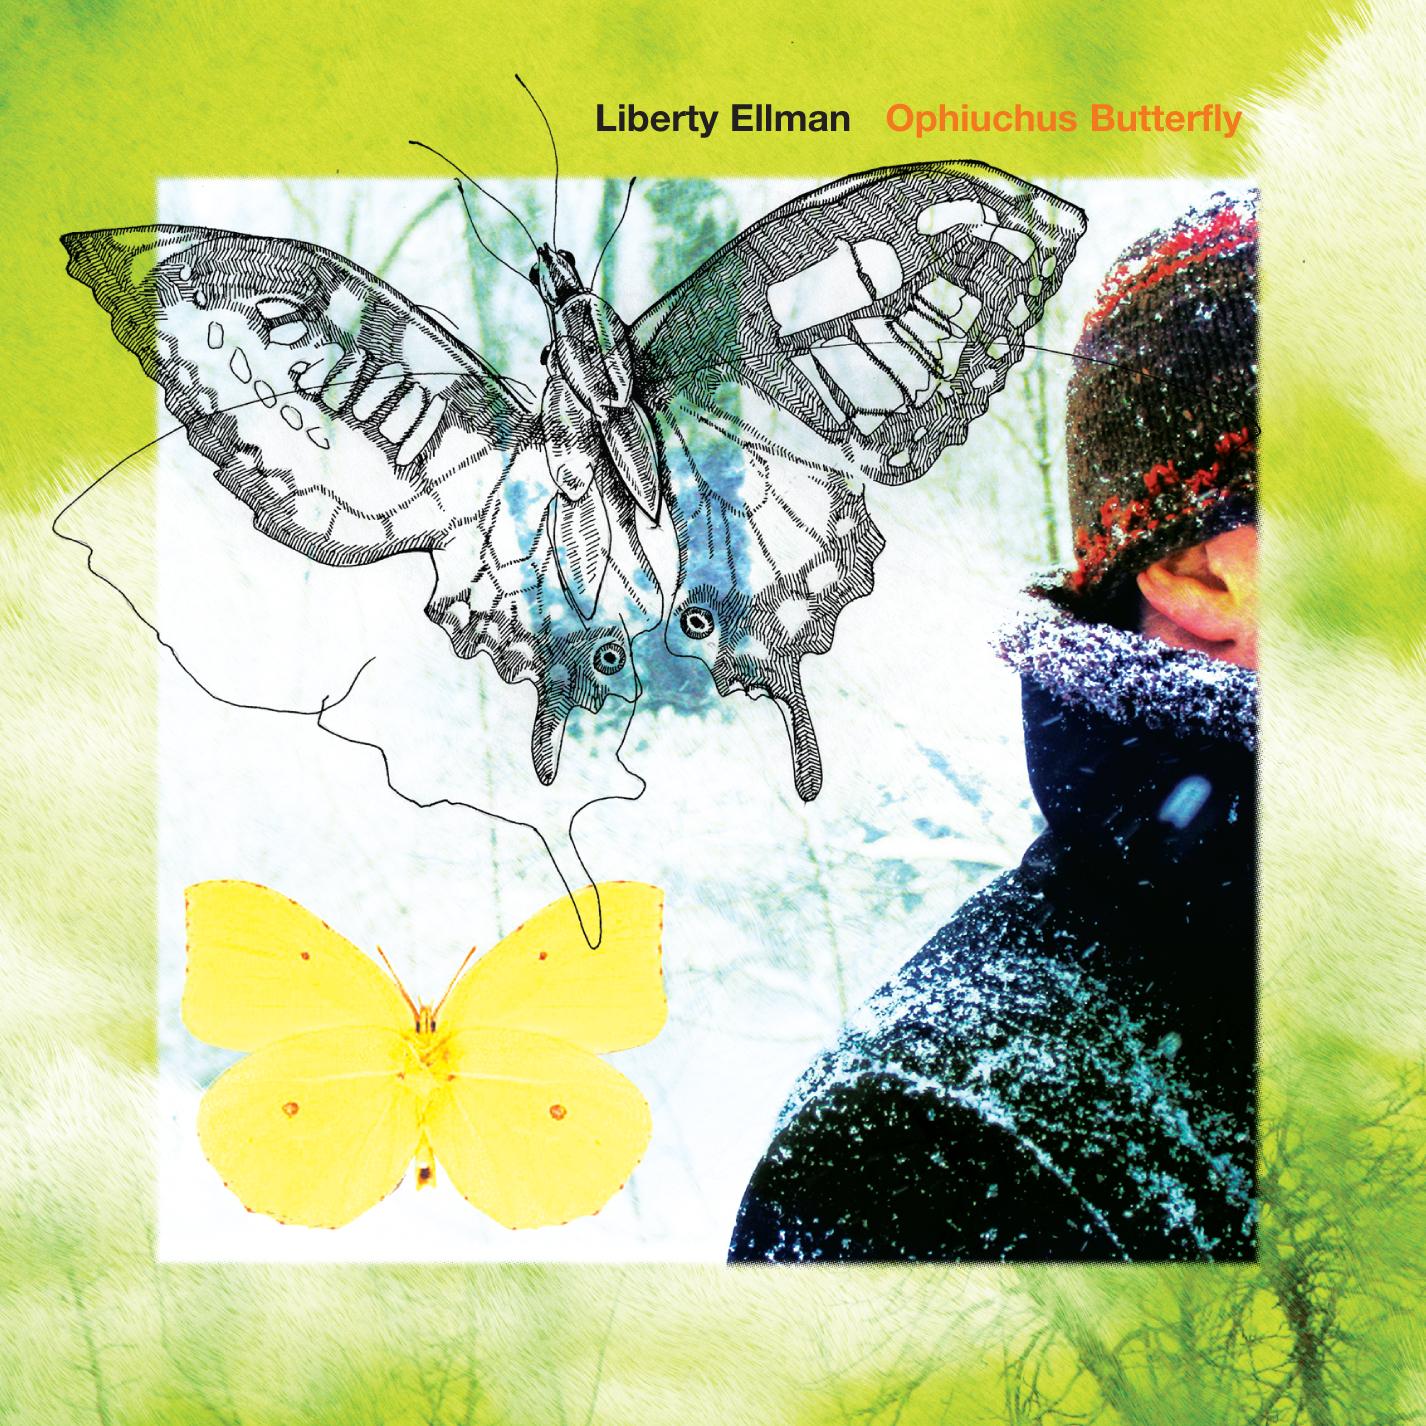 Ophiuchus Butterfly - Libery Ellman